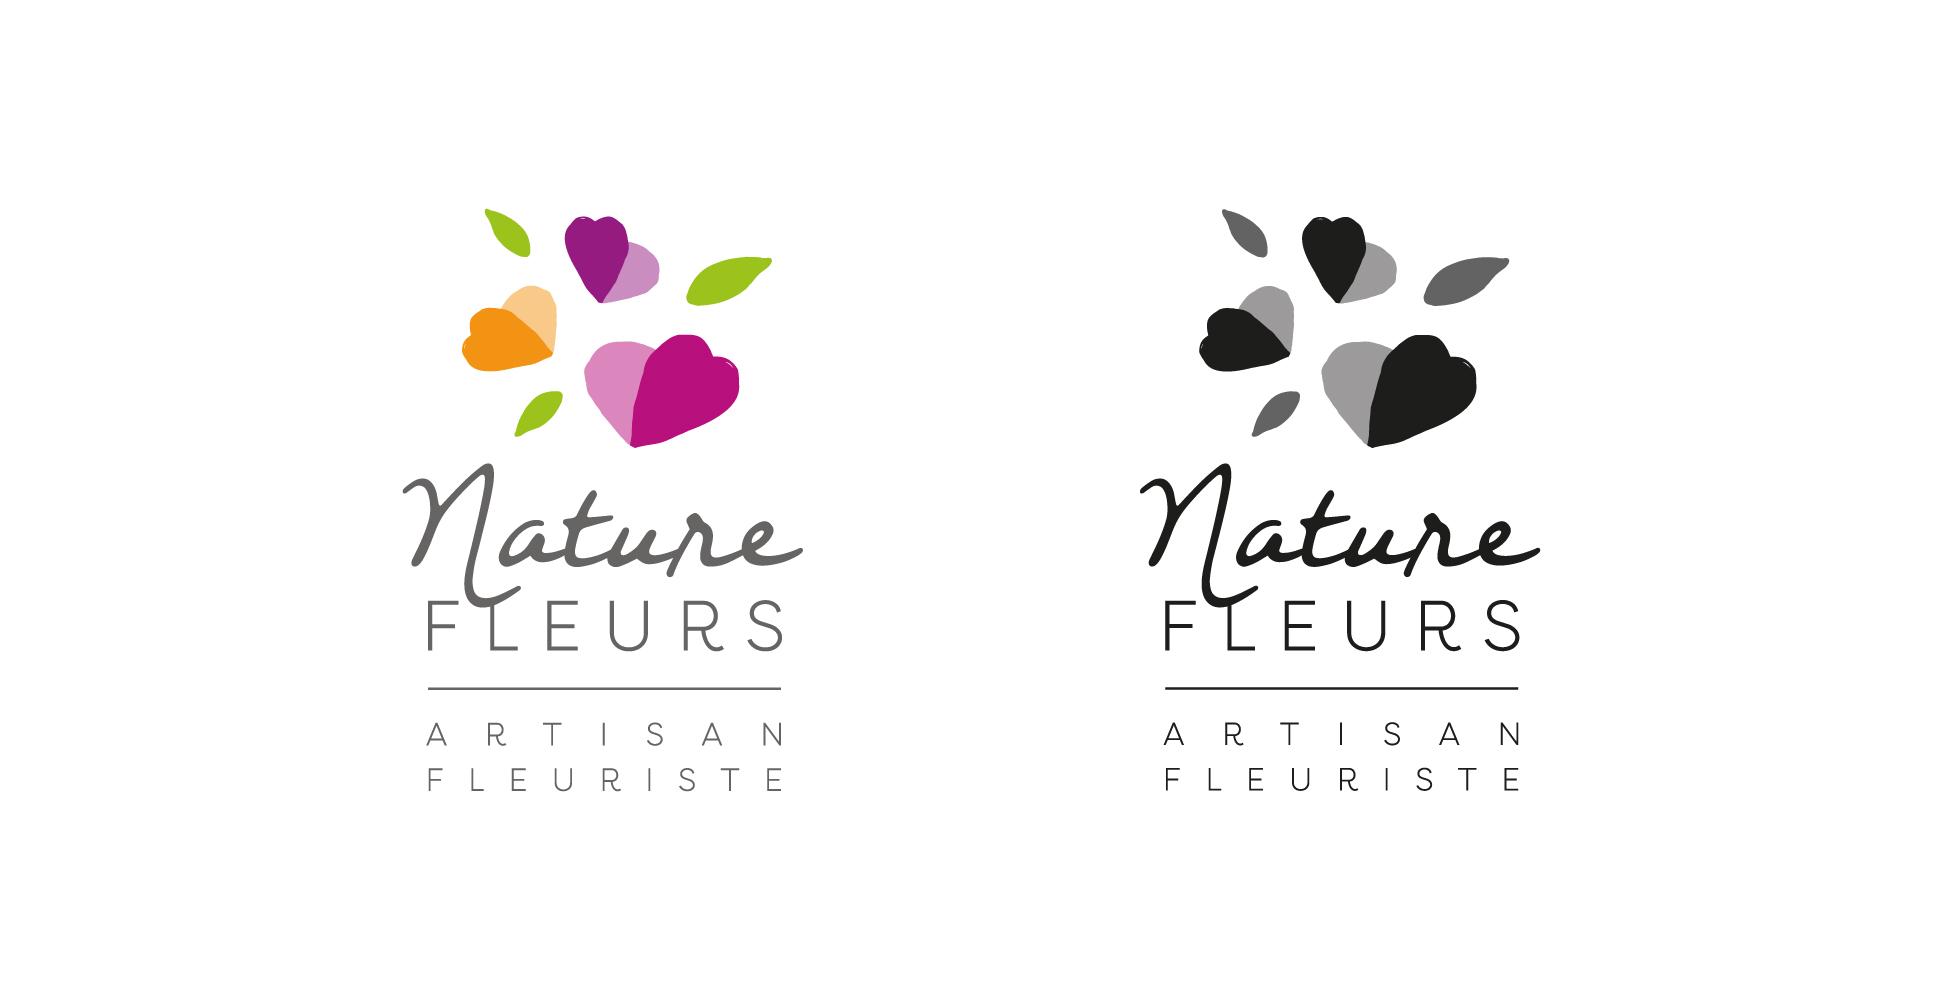 NATURE-FLEURS-mockup-1